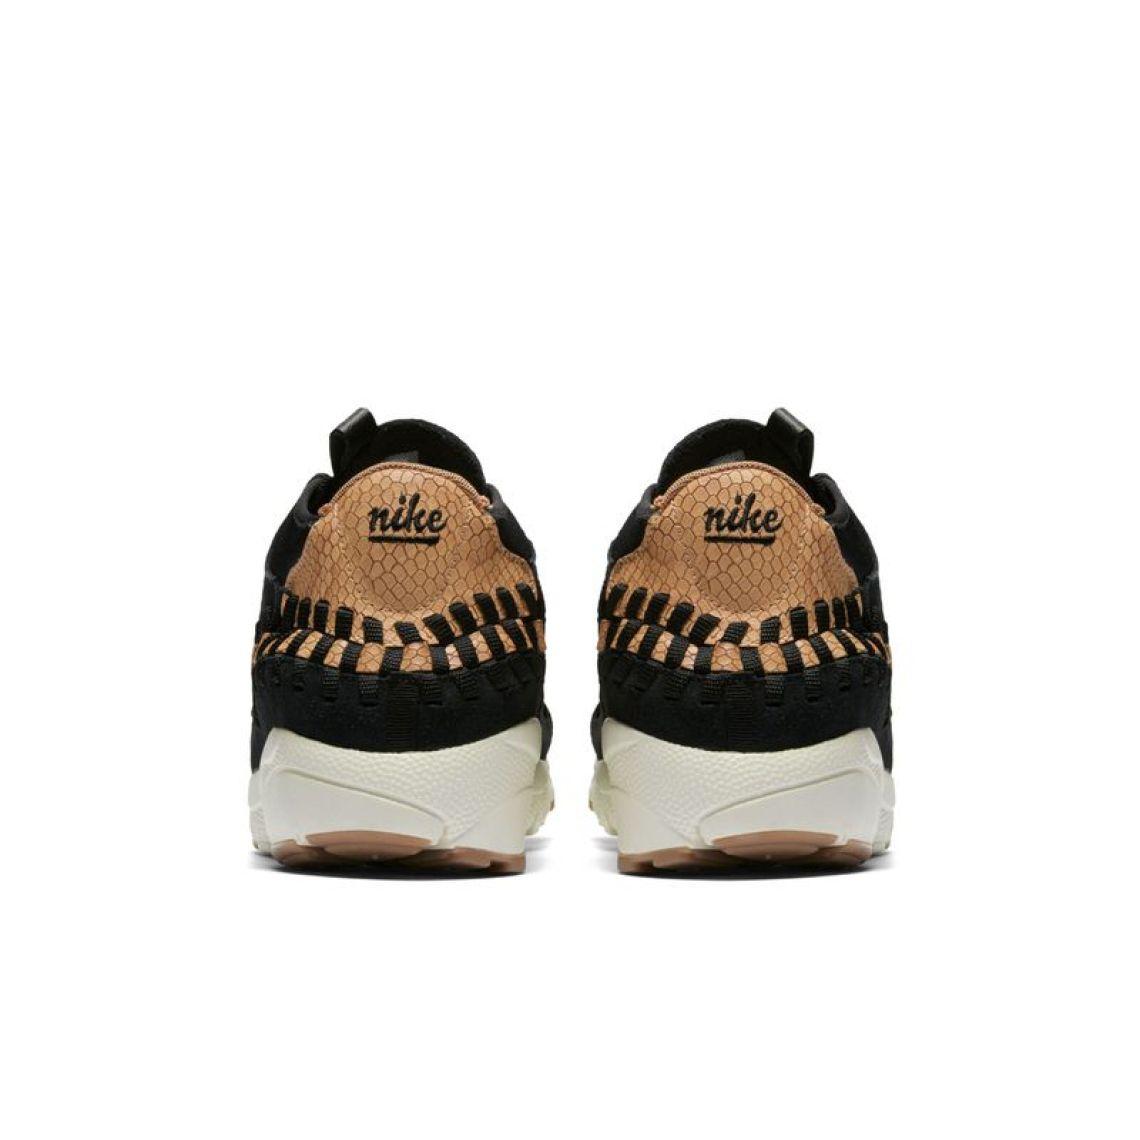 Nike Air Footscape Woven Chukka Black/Dark Russet